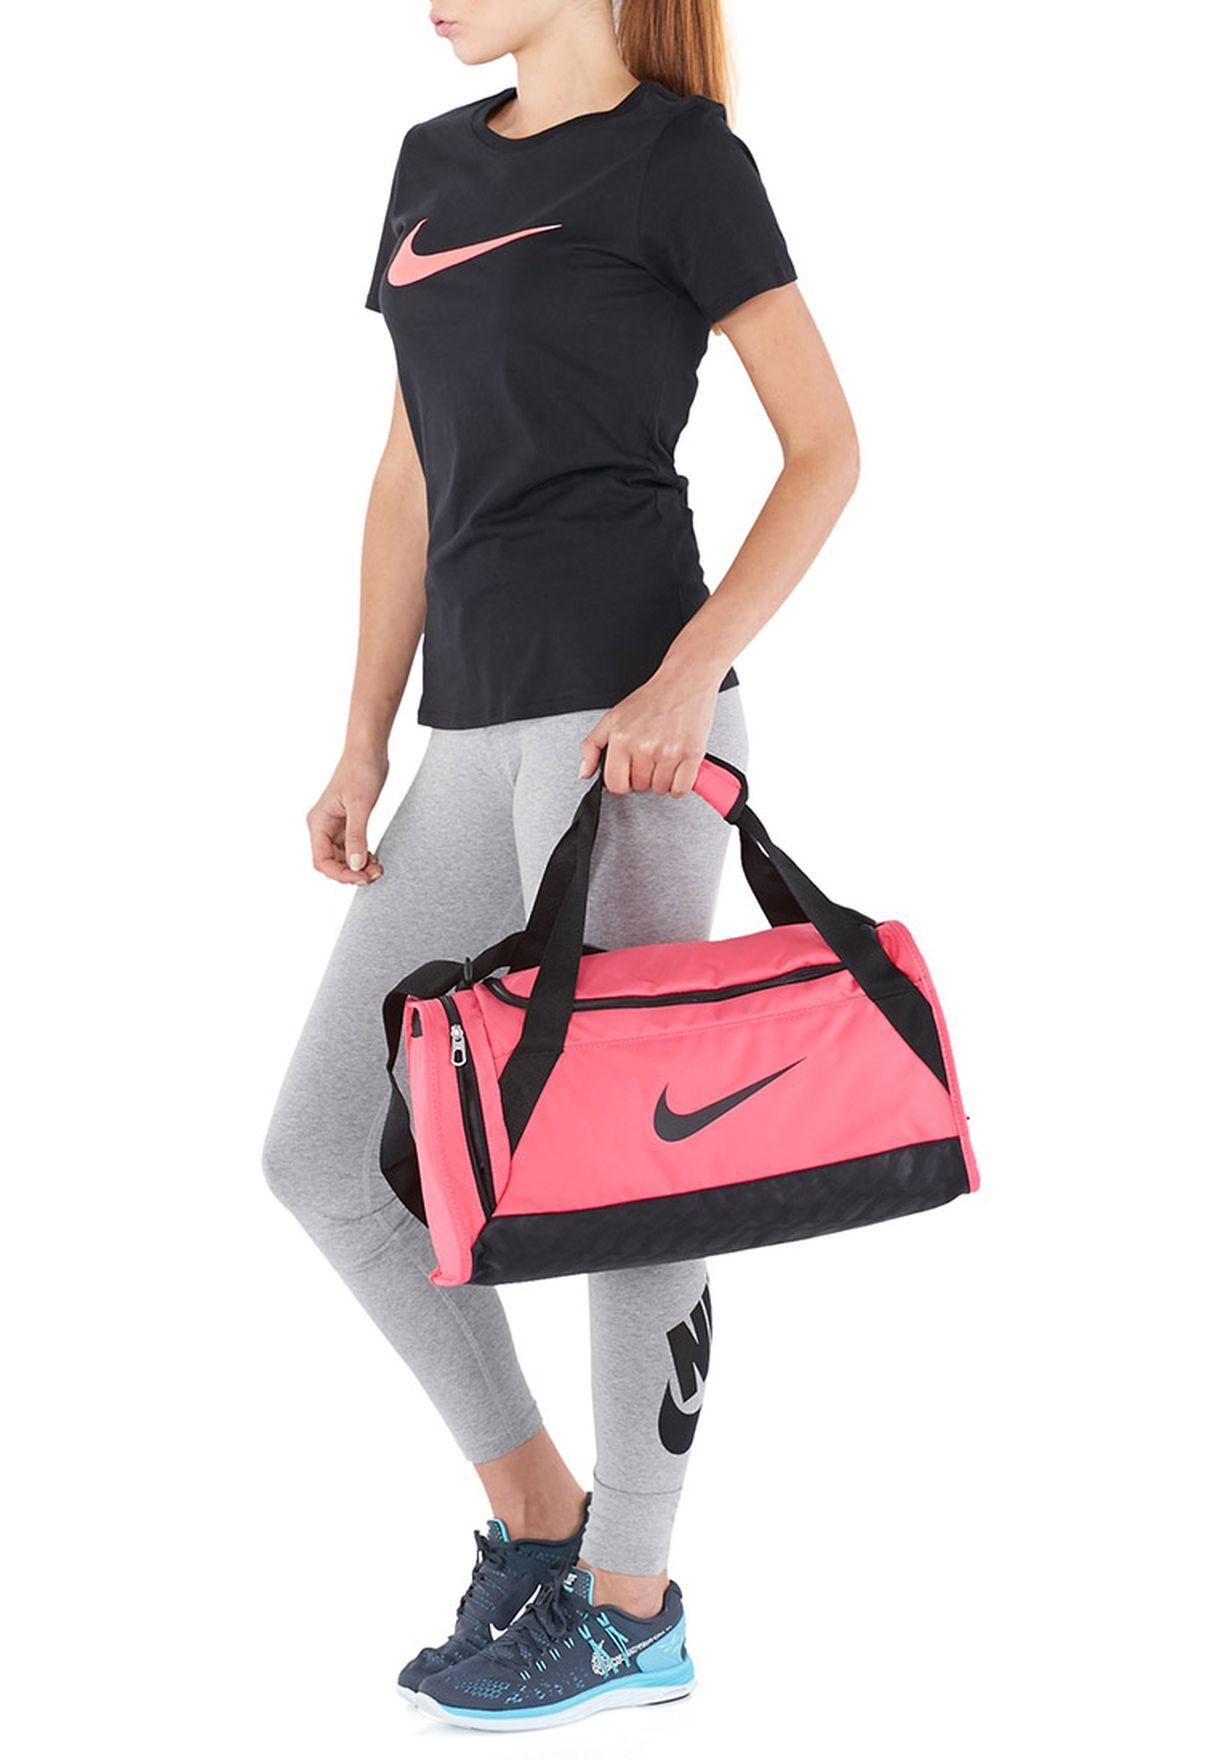 debdc4418a7c Shop Nike pink Extra Small Brasilia 6 Duffel Bag BA4911-606 for ...